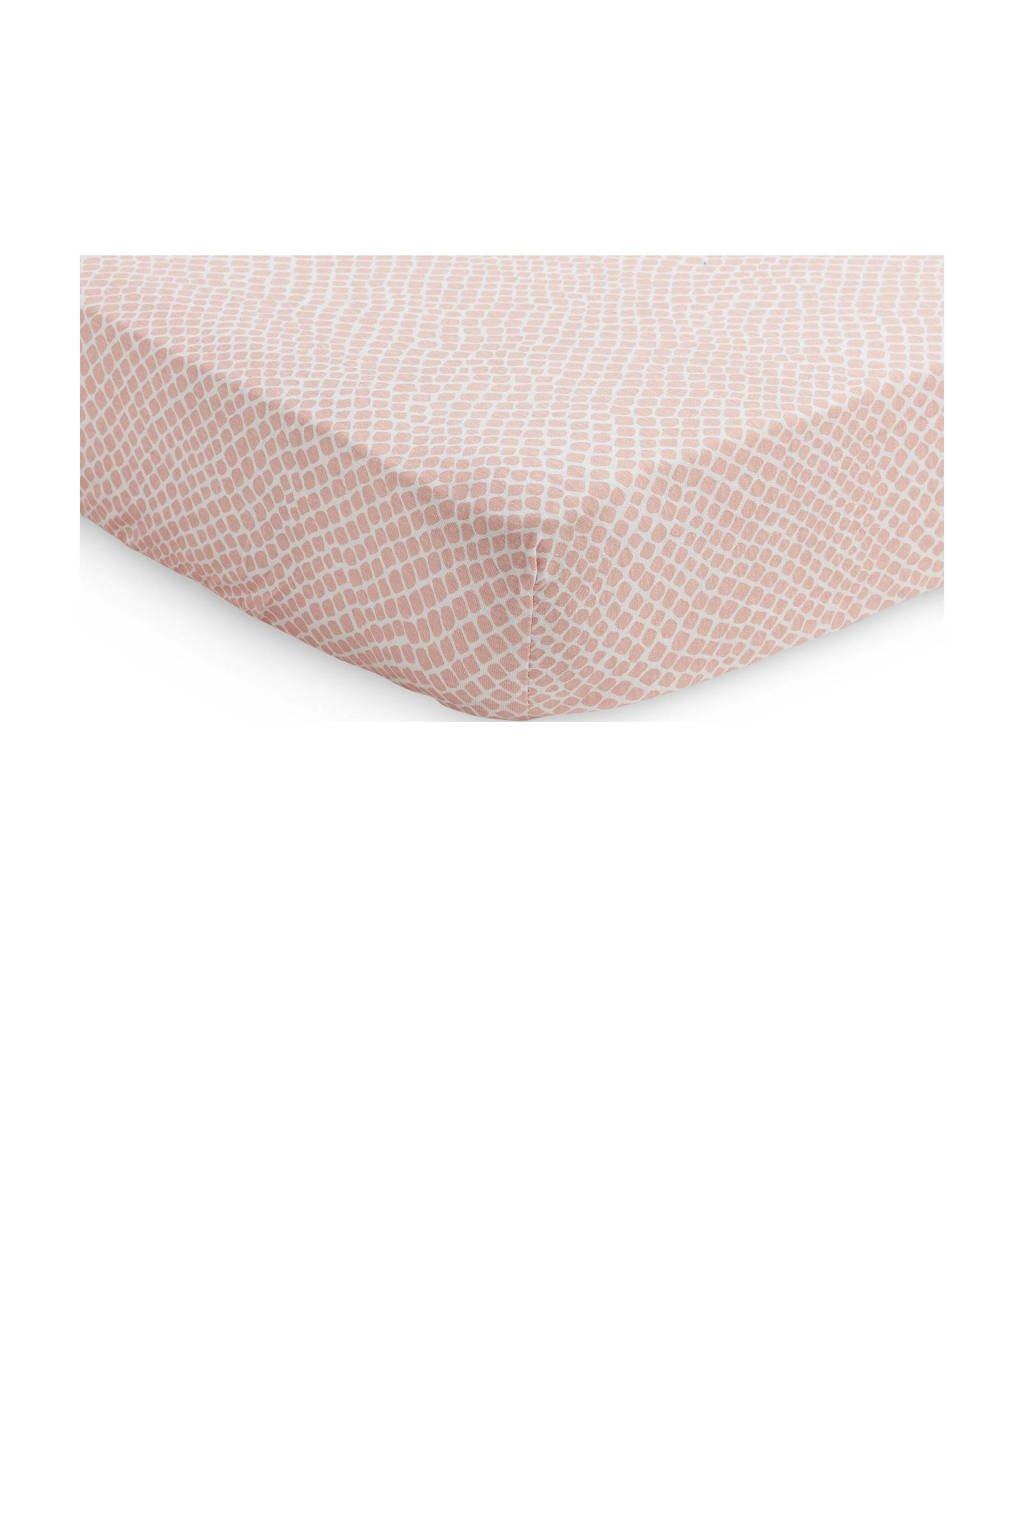 Jollein jersey baby ledikant hoeslaken 60x120cm Snake pale pink, Roze